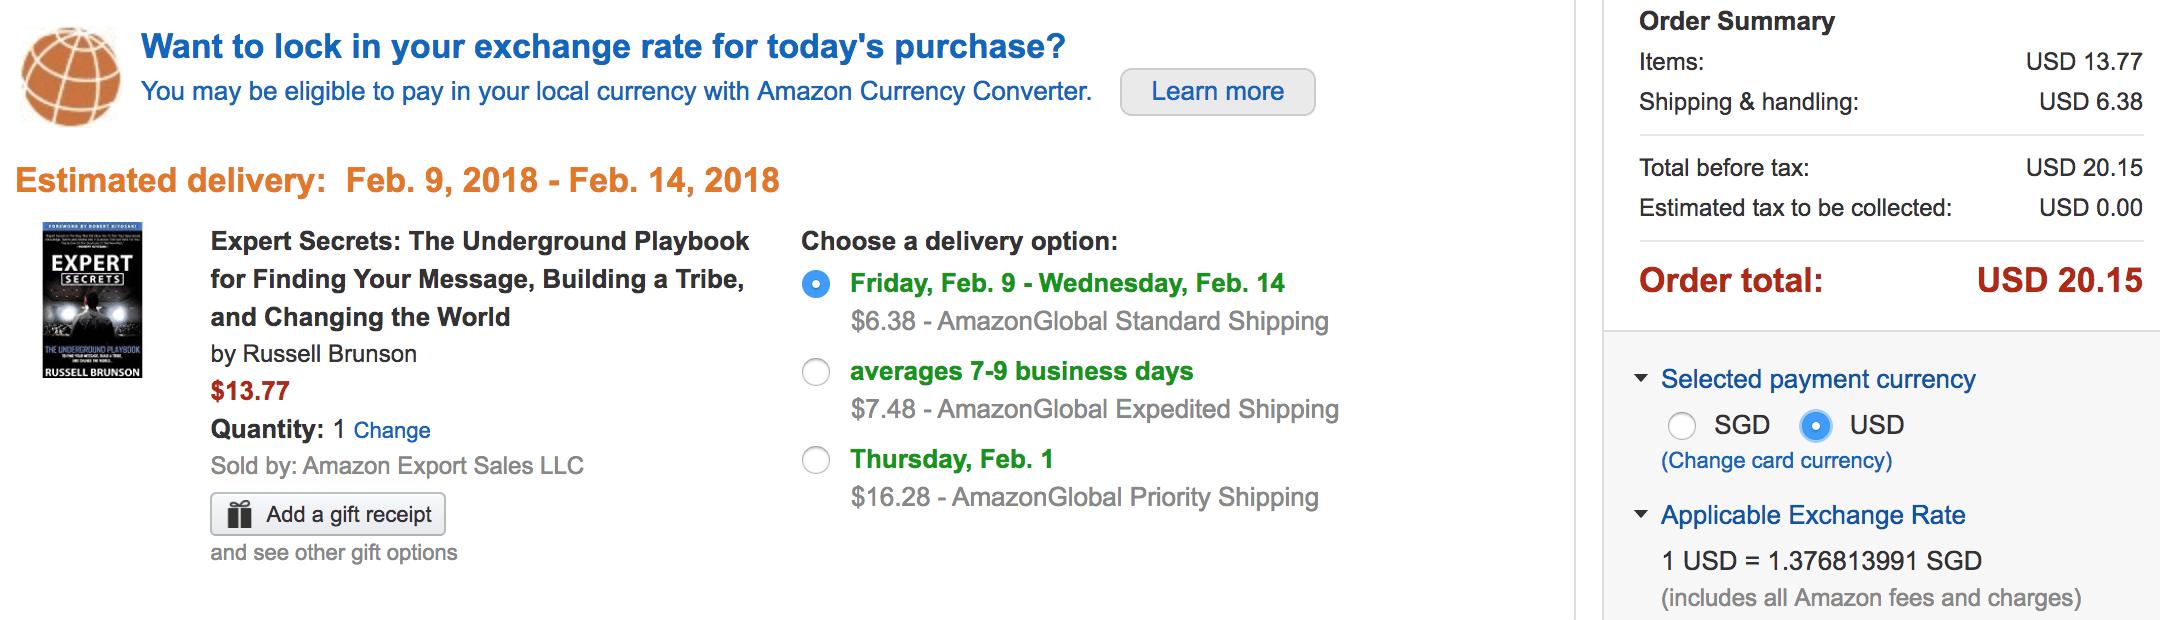 Expert Secrets Ordering through Amazon